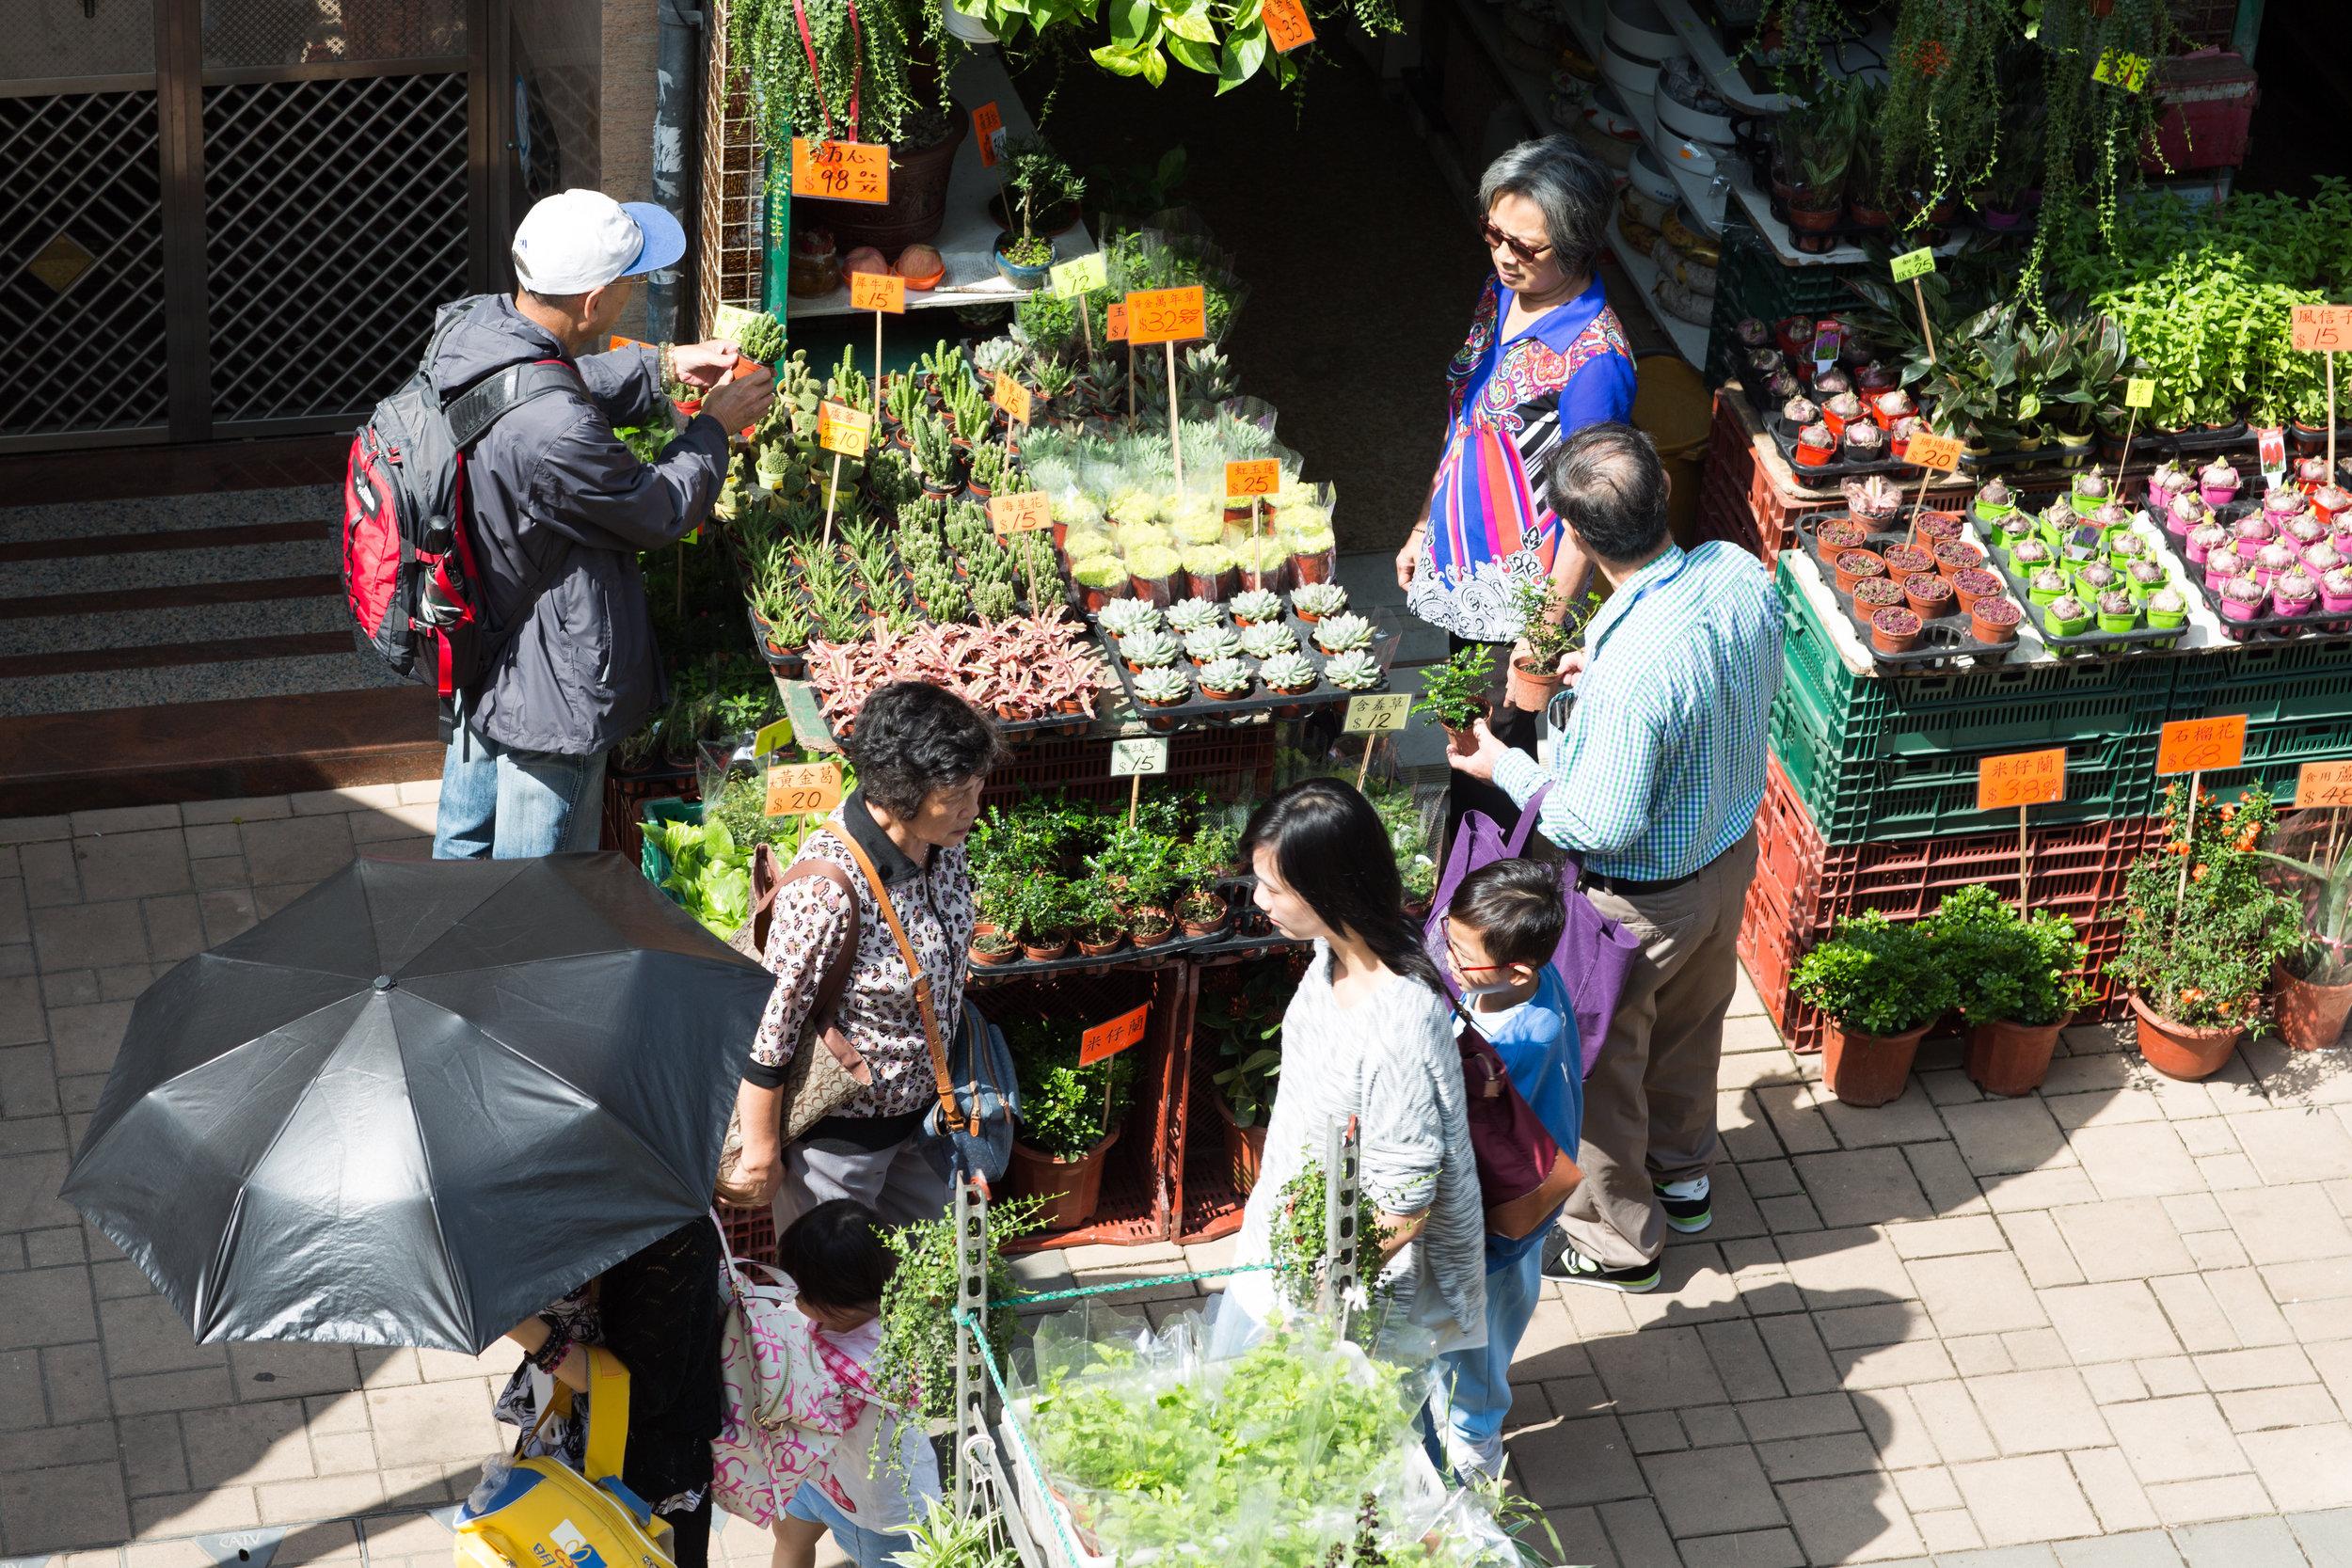 People visiting the flower market in Mongkok Hong Kong